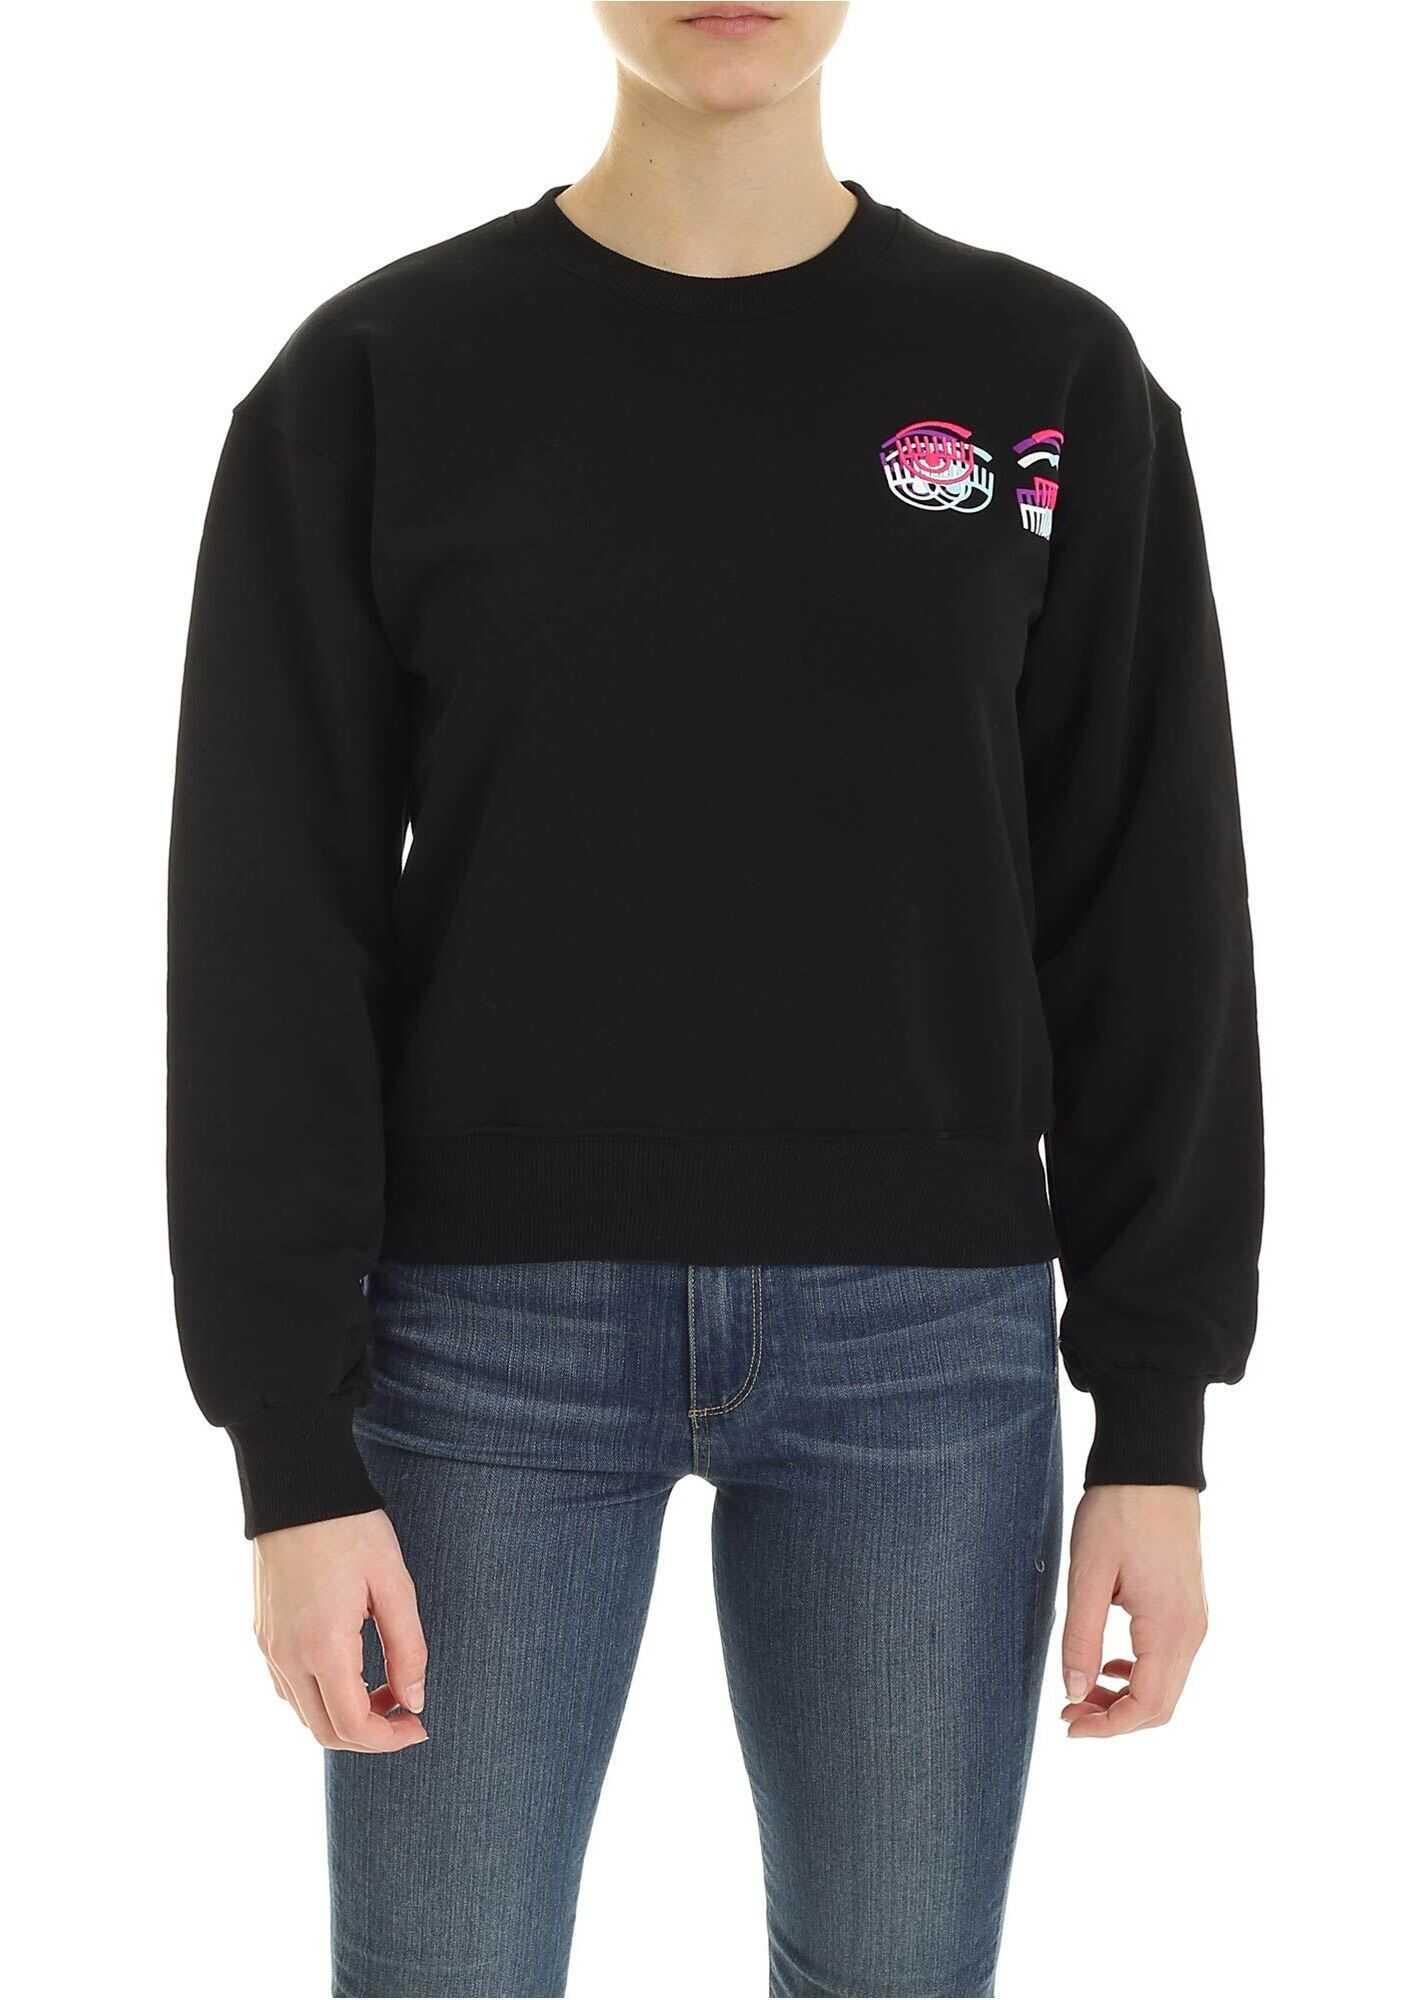 Chiara Ferragni Glitch Sweatshirt In Black Black